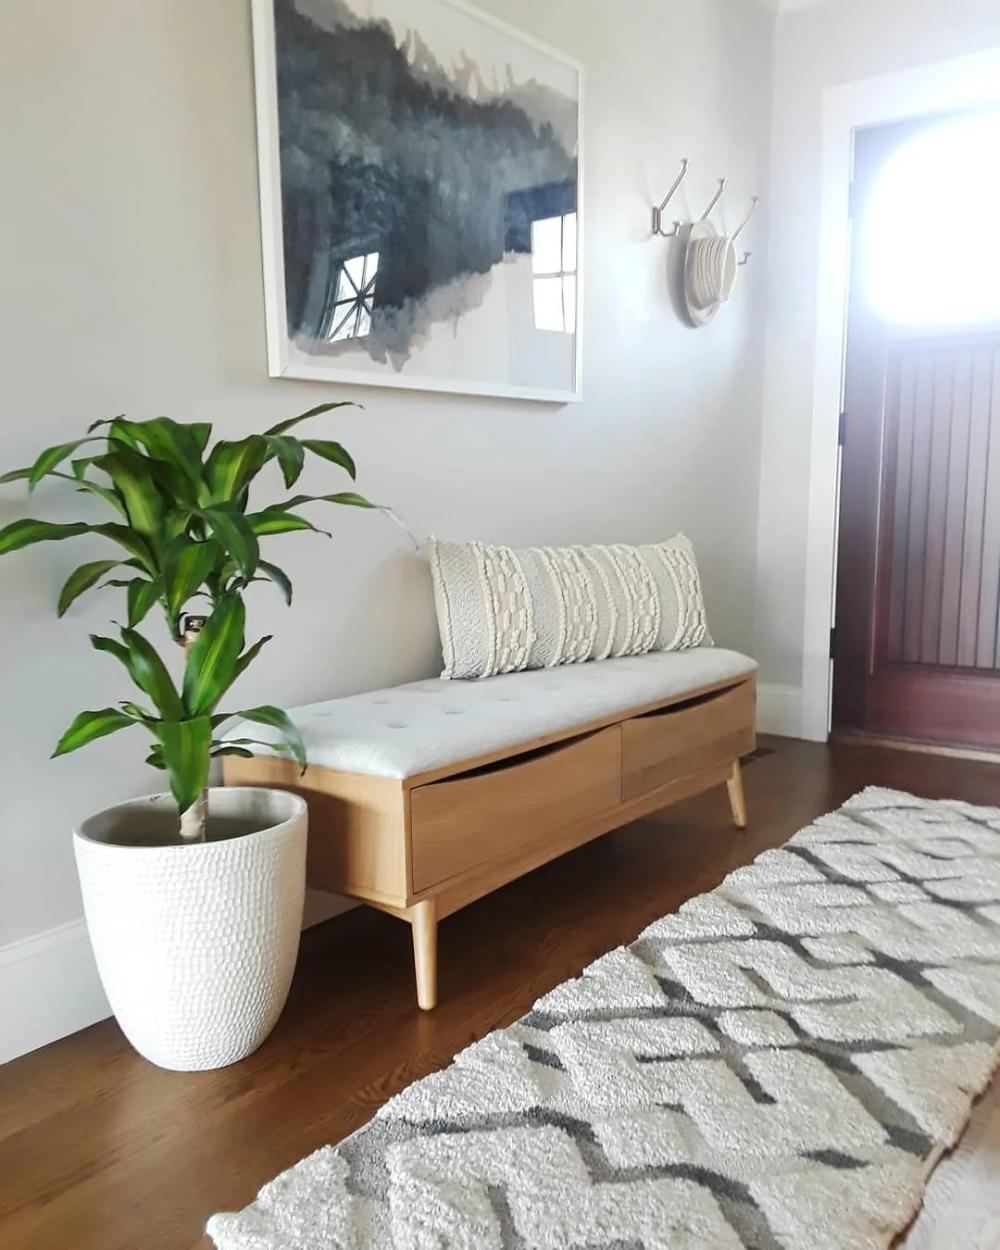 Culla Oak Bench Bedroom Bench Modern Living Room Bench Comfy Bench #small #living #room #bench